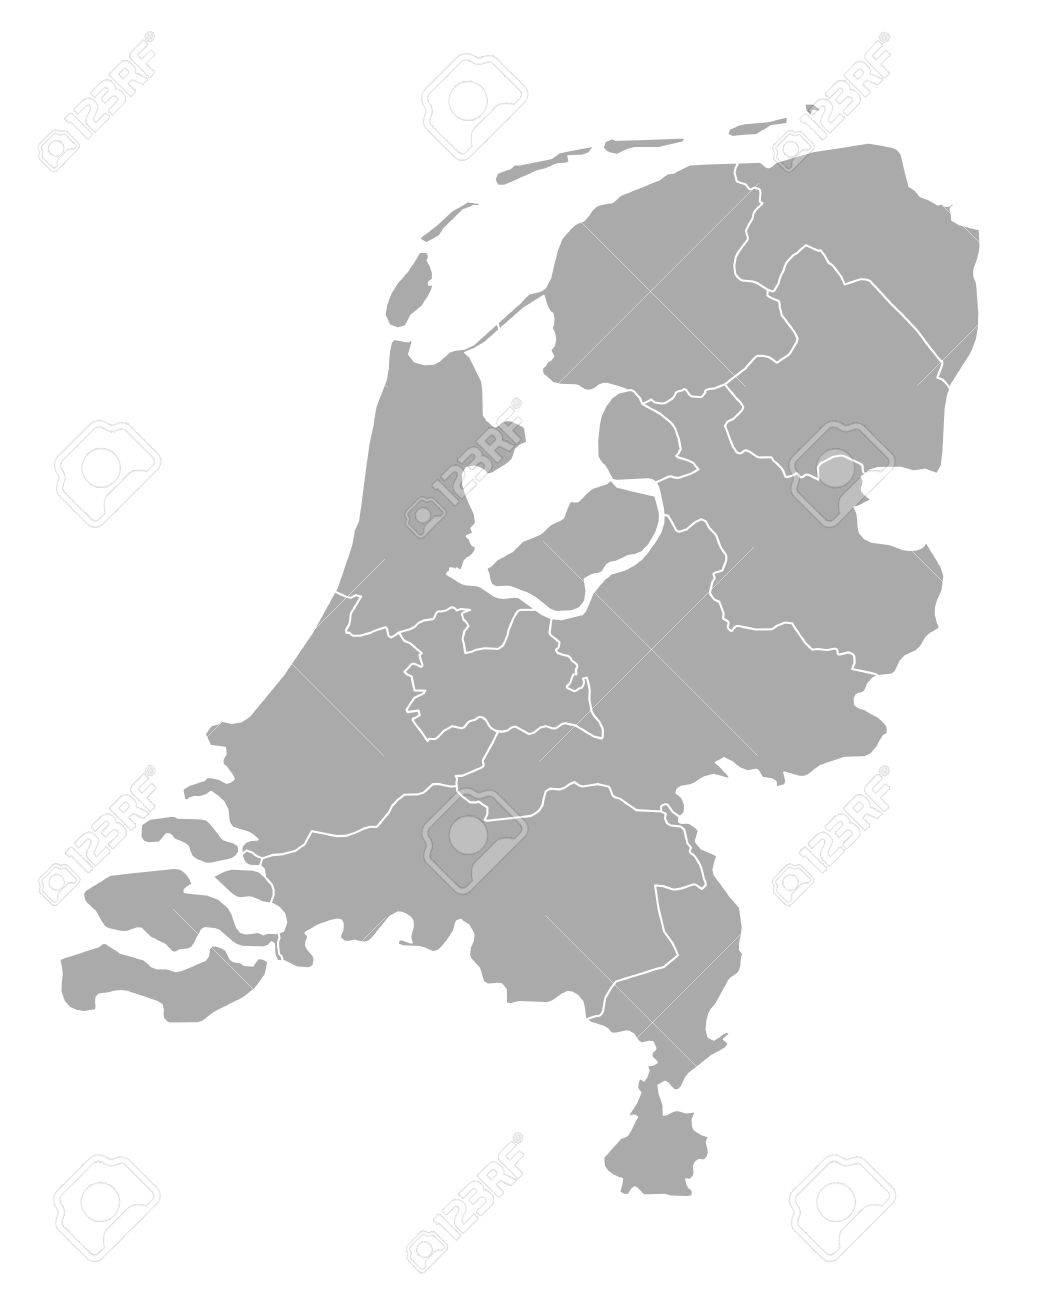 Map of thr Netherlands - 48108119